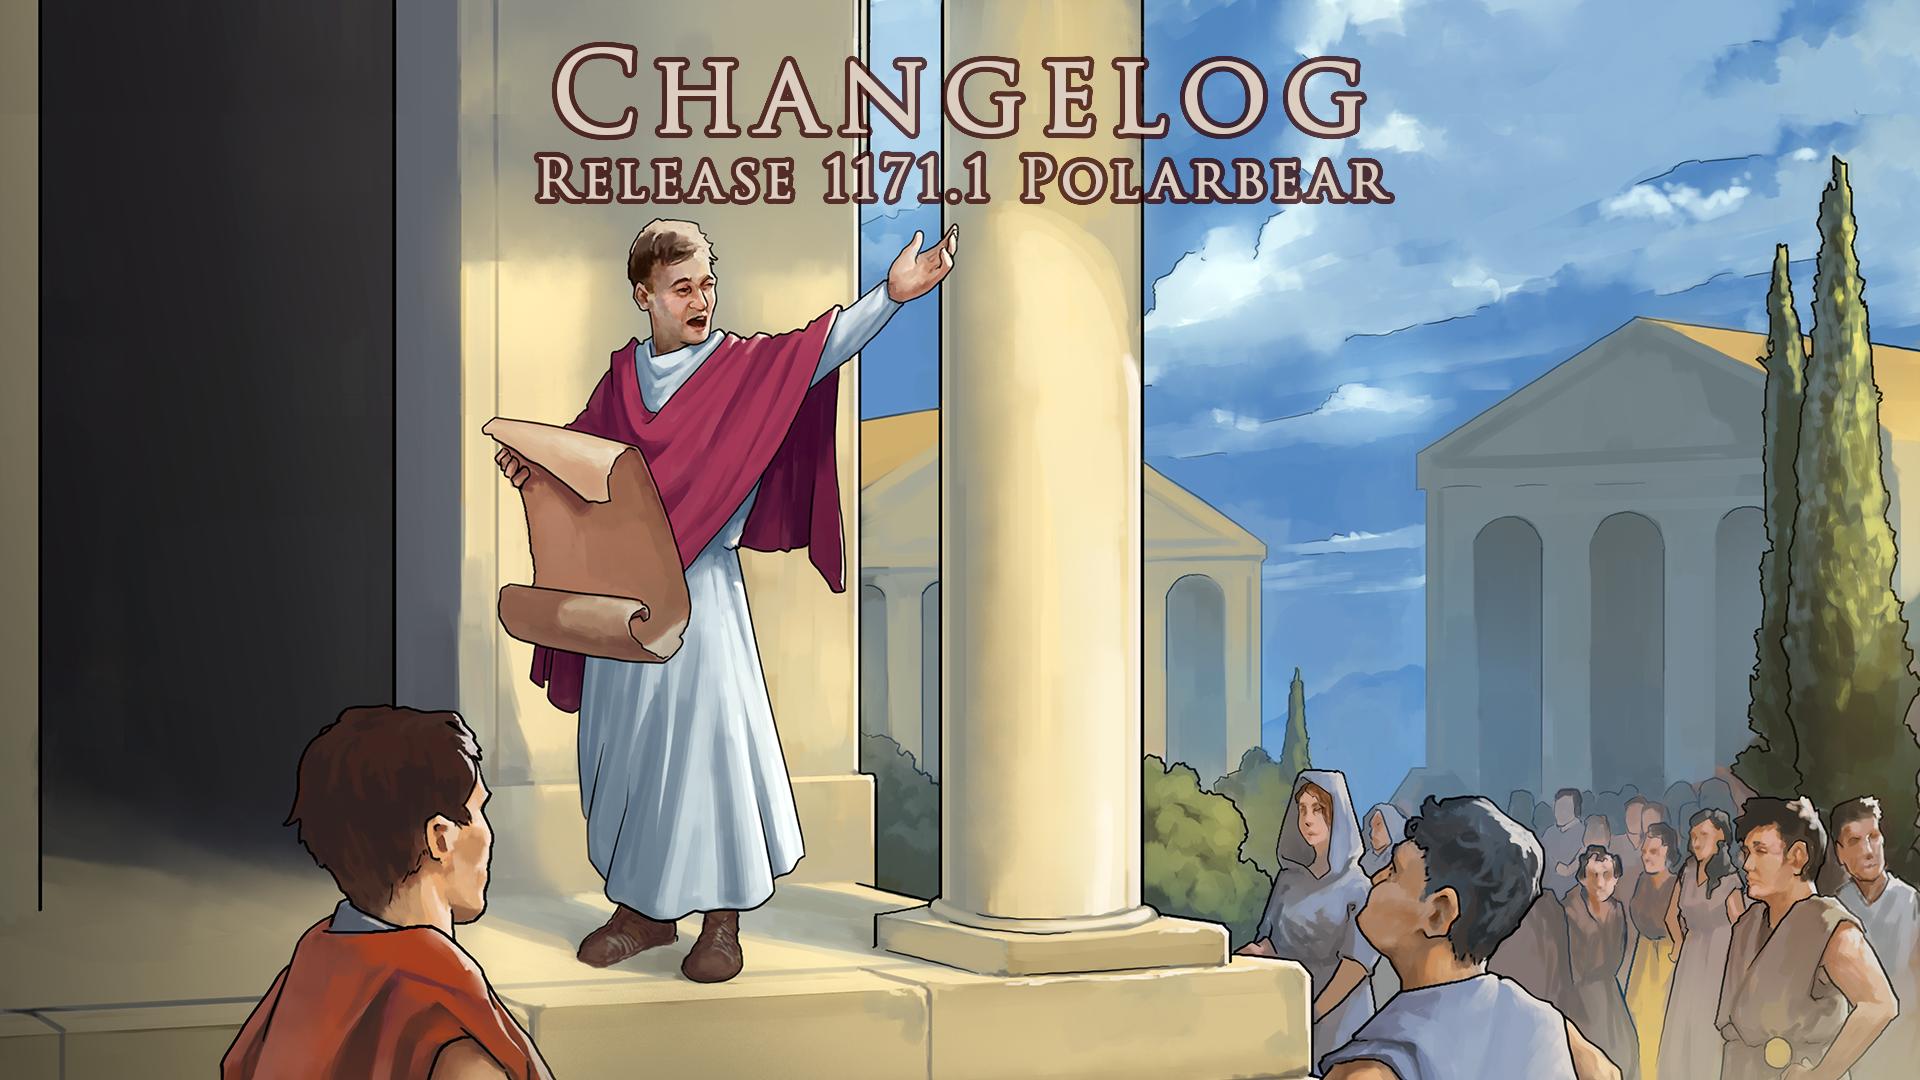 CHANGELOG ~ RELEASE POLARBEAR 1171.1